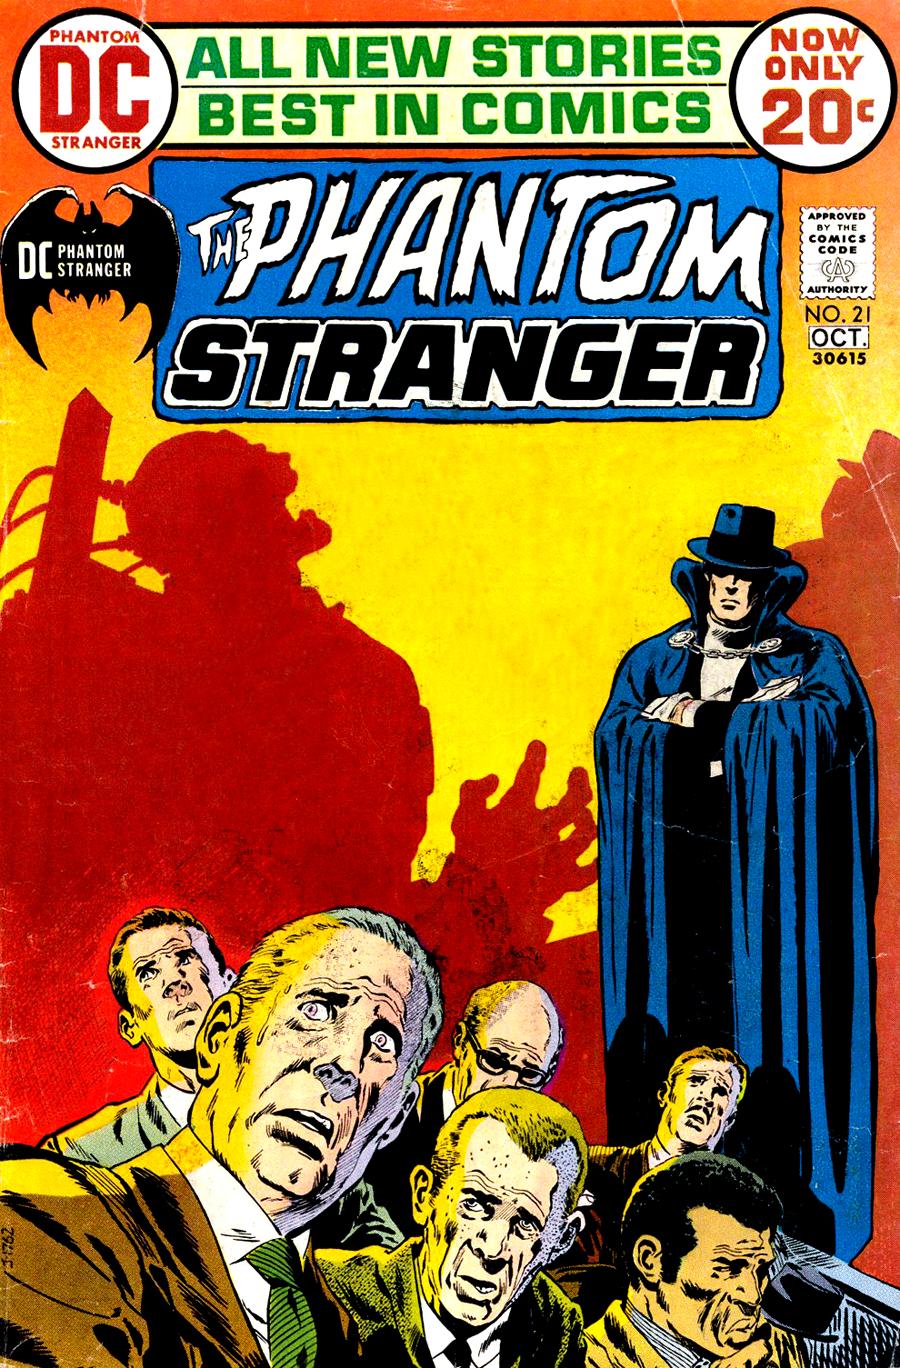 Phantom Stranger #21 cover by Jim Aparo